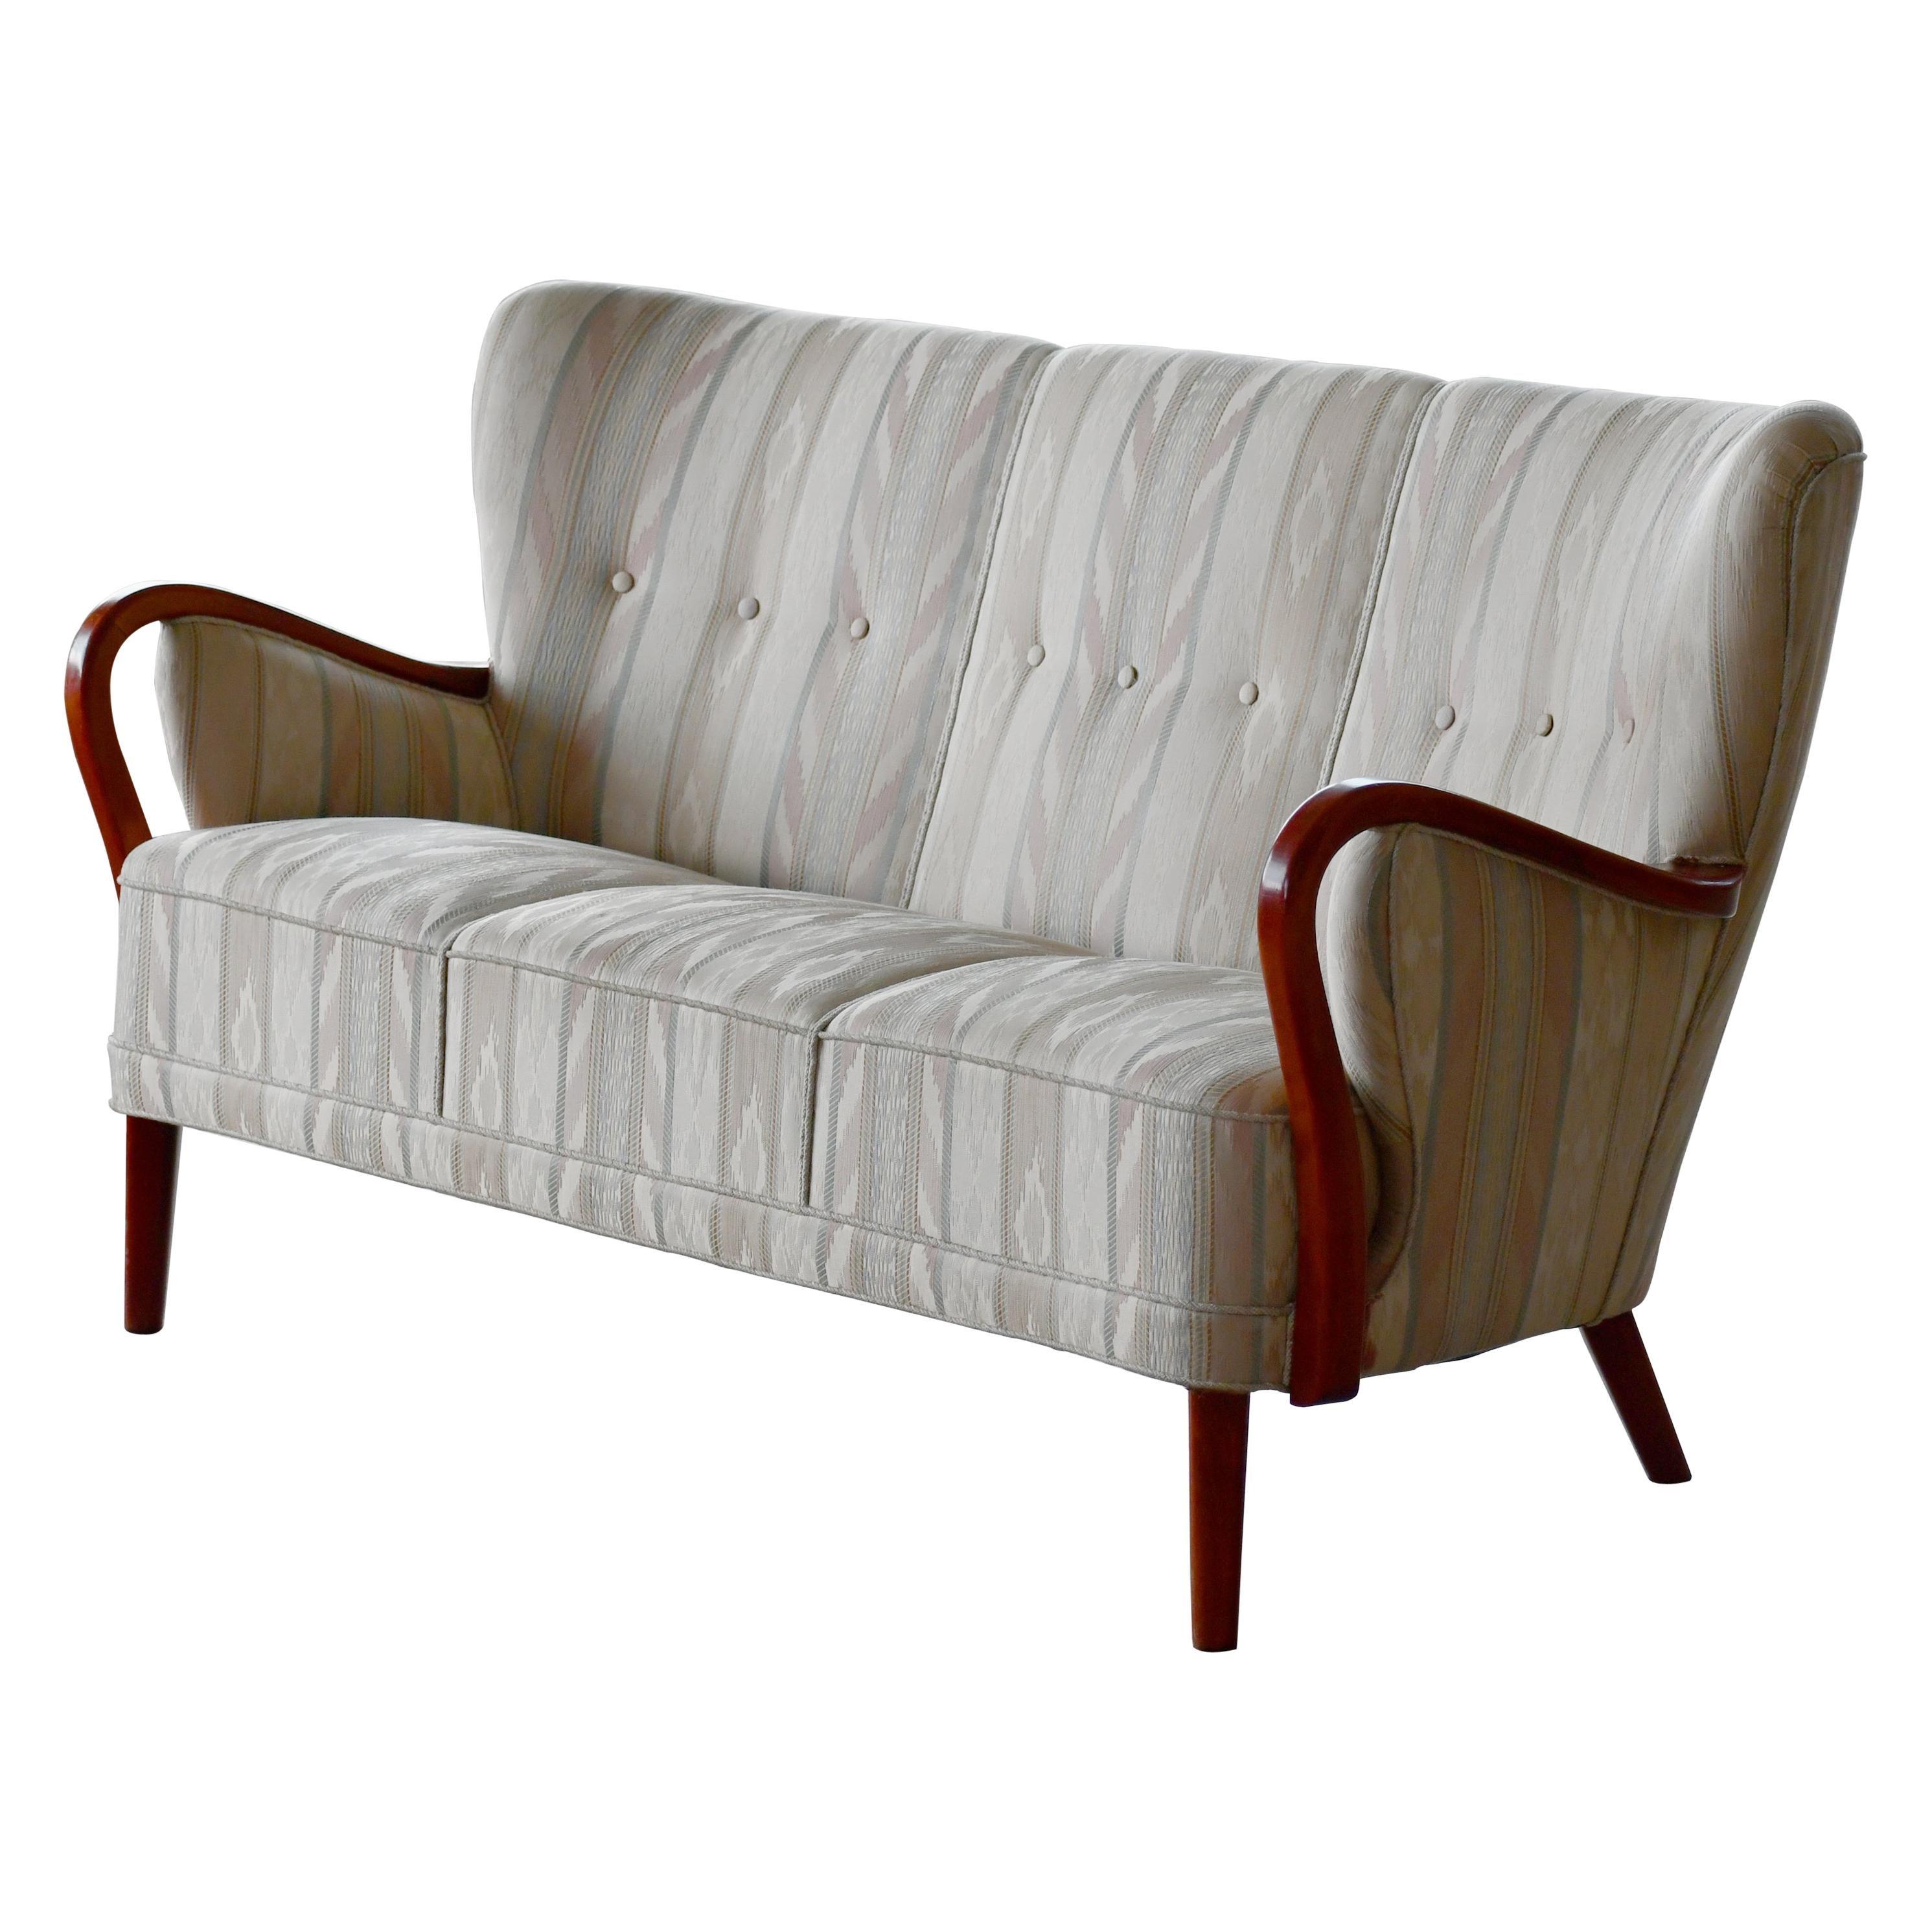 Danish 1940s Sofa with Open Armrests by Alfred Christensen for Slagelse